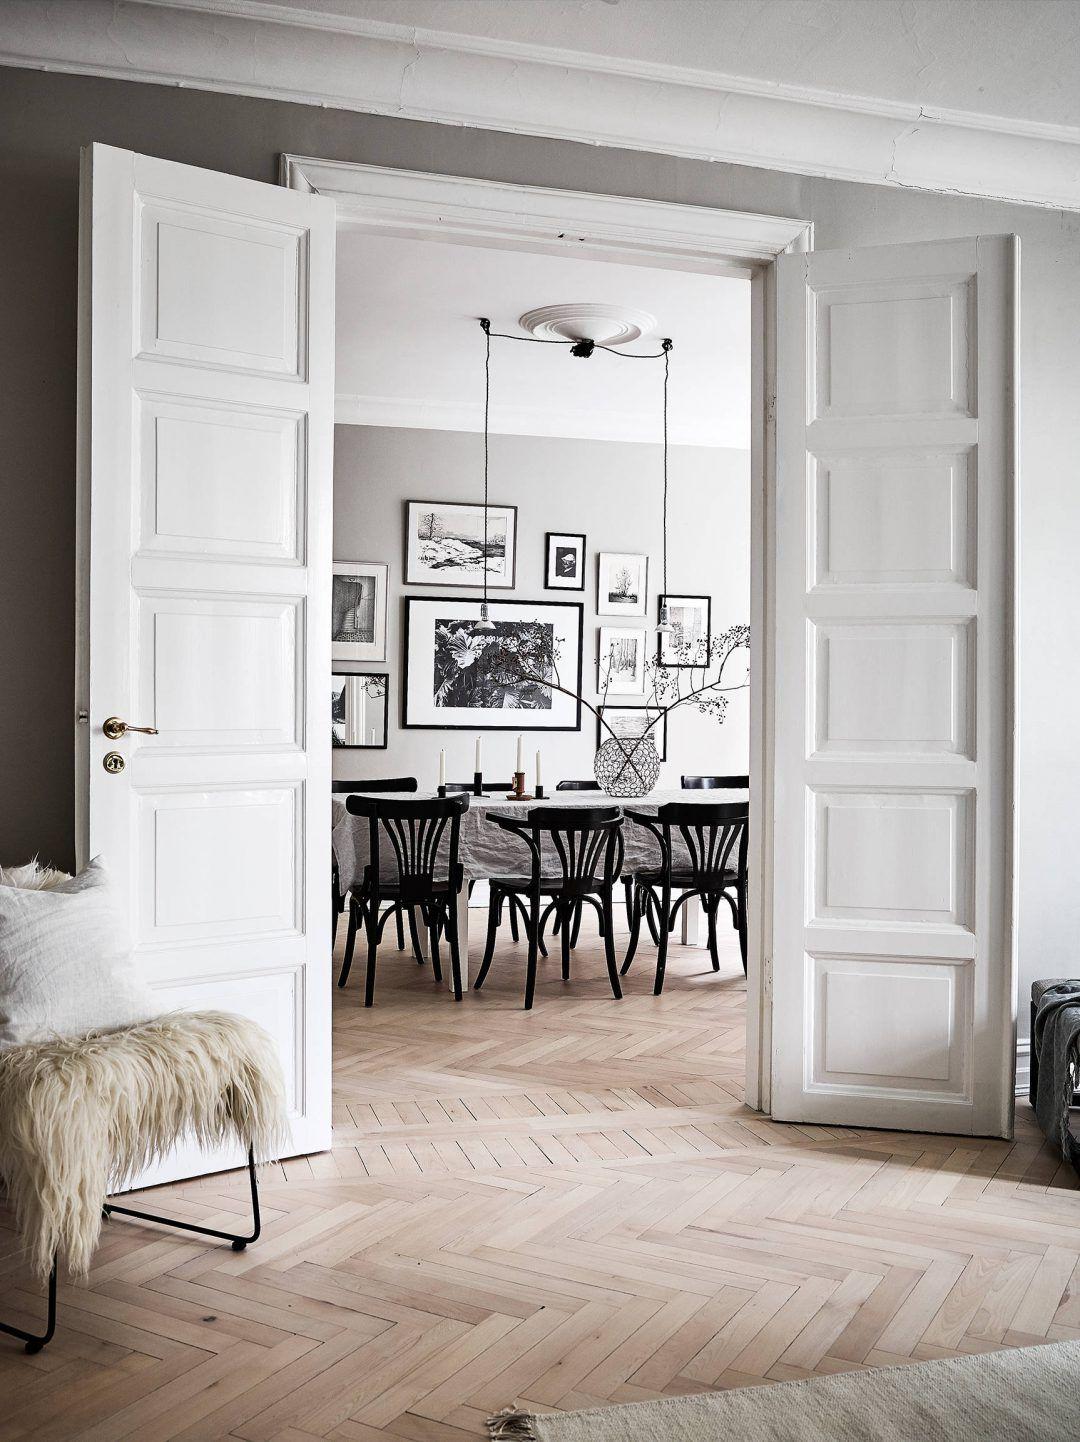 Sal n n rdico puertas dobles blancas paredes grises y for Paredes grises y puertas blancas